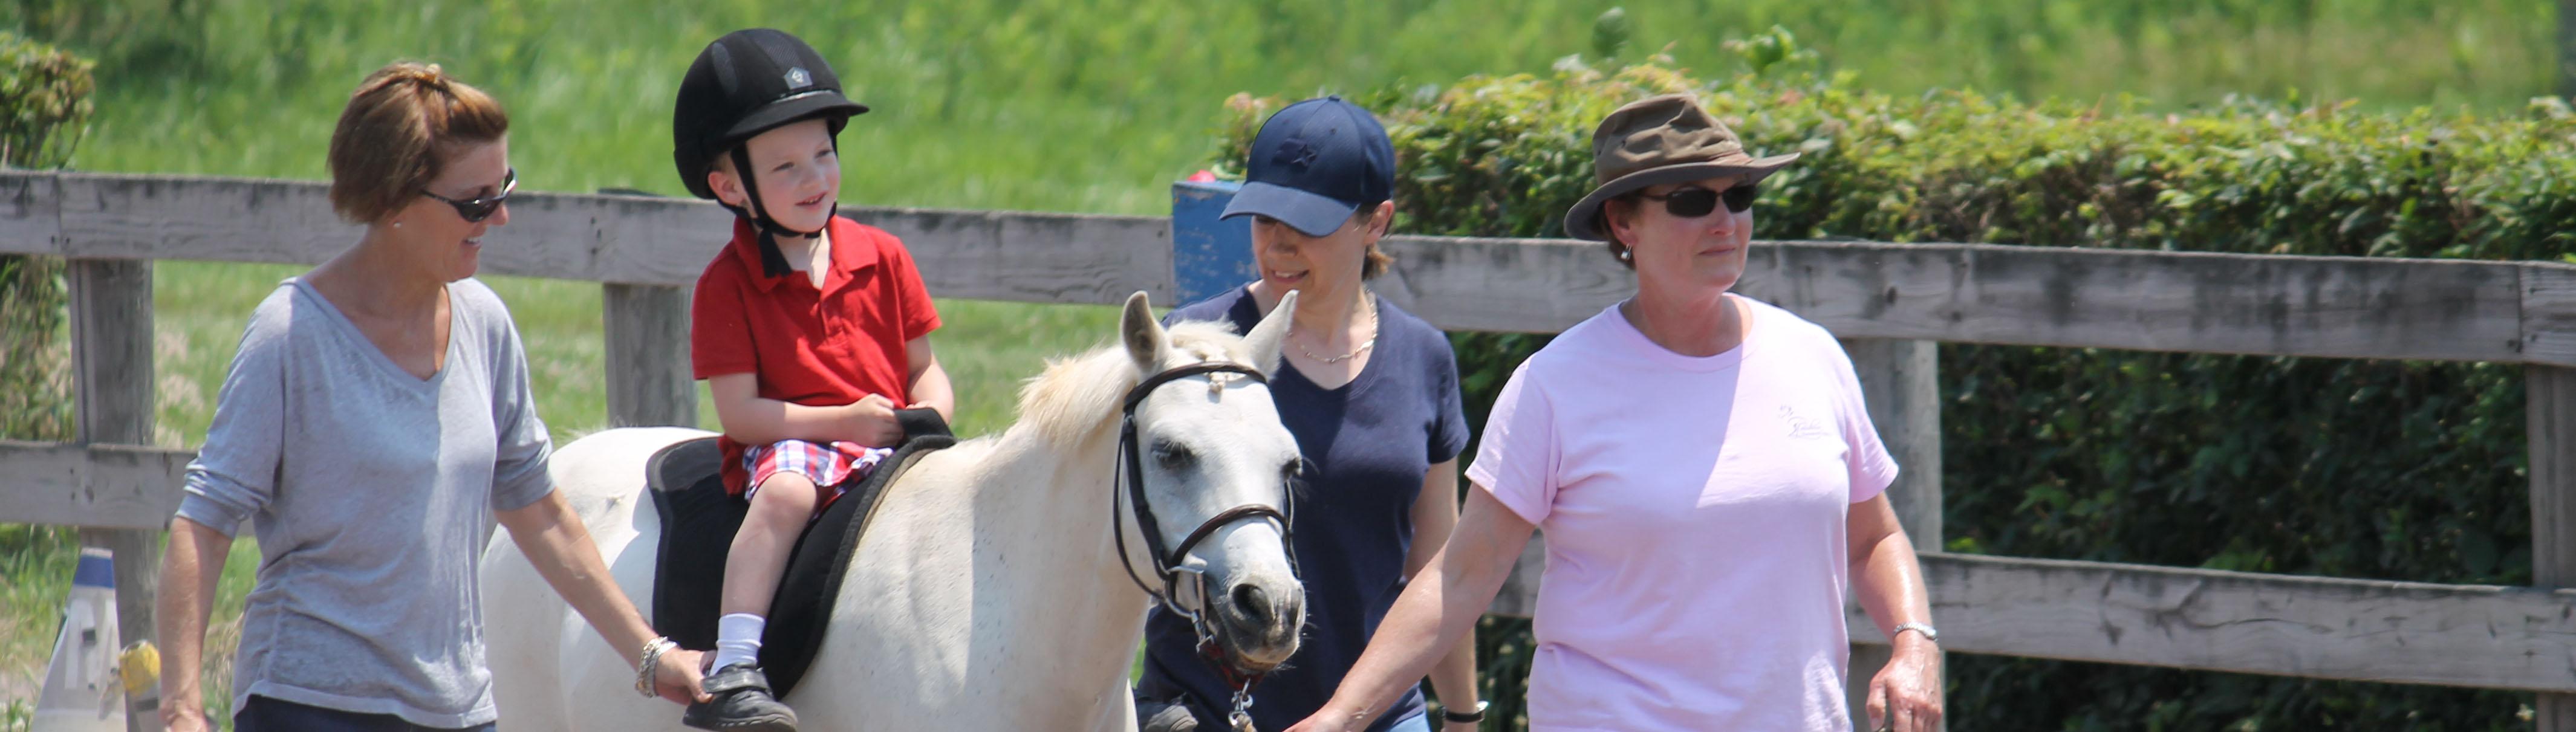 Hippotherapy - Loudoun Therapeutic Riding